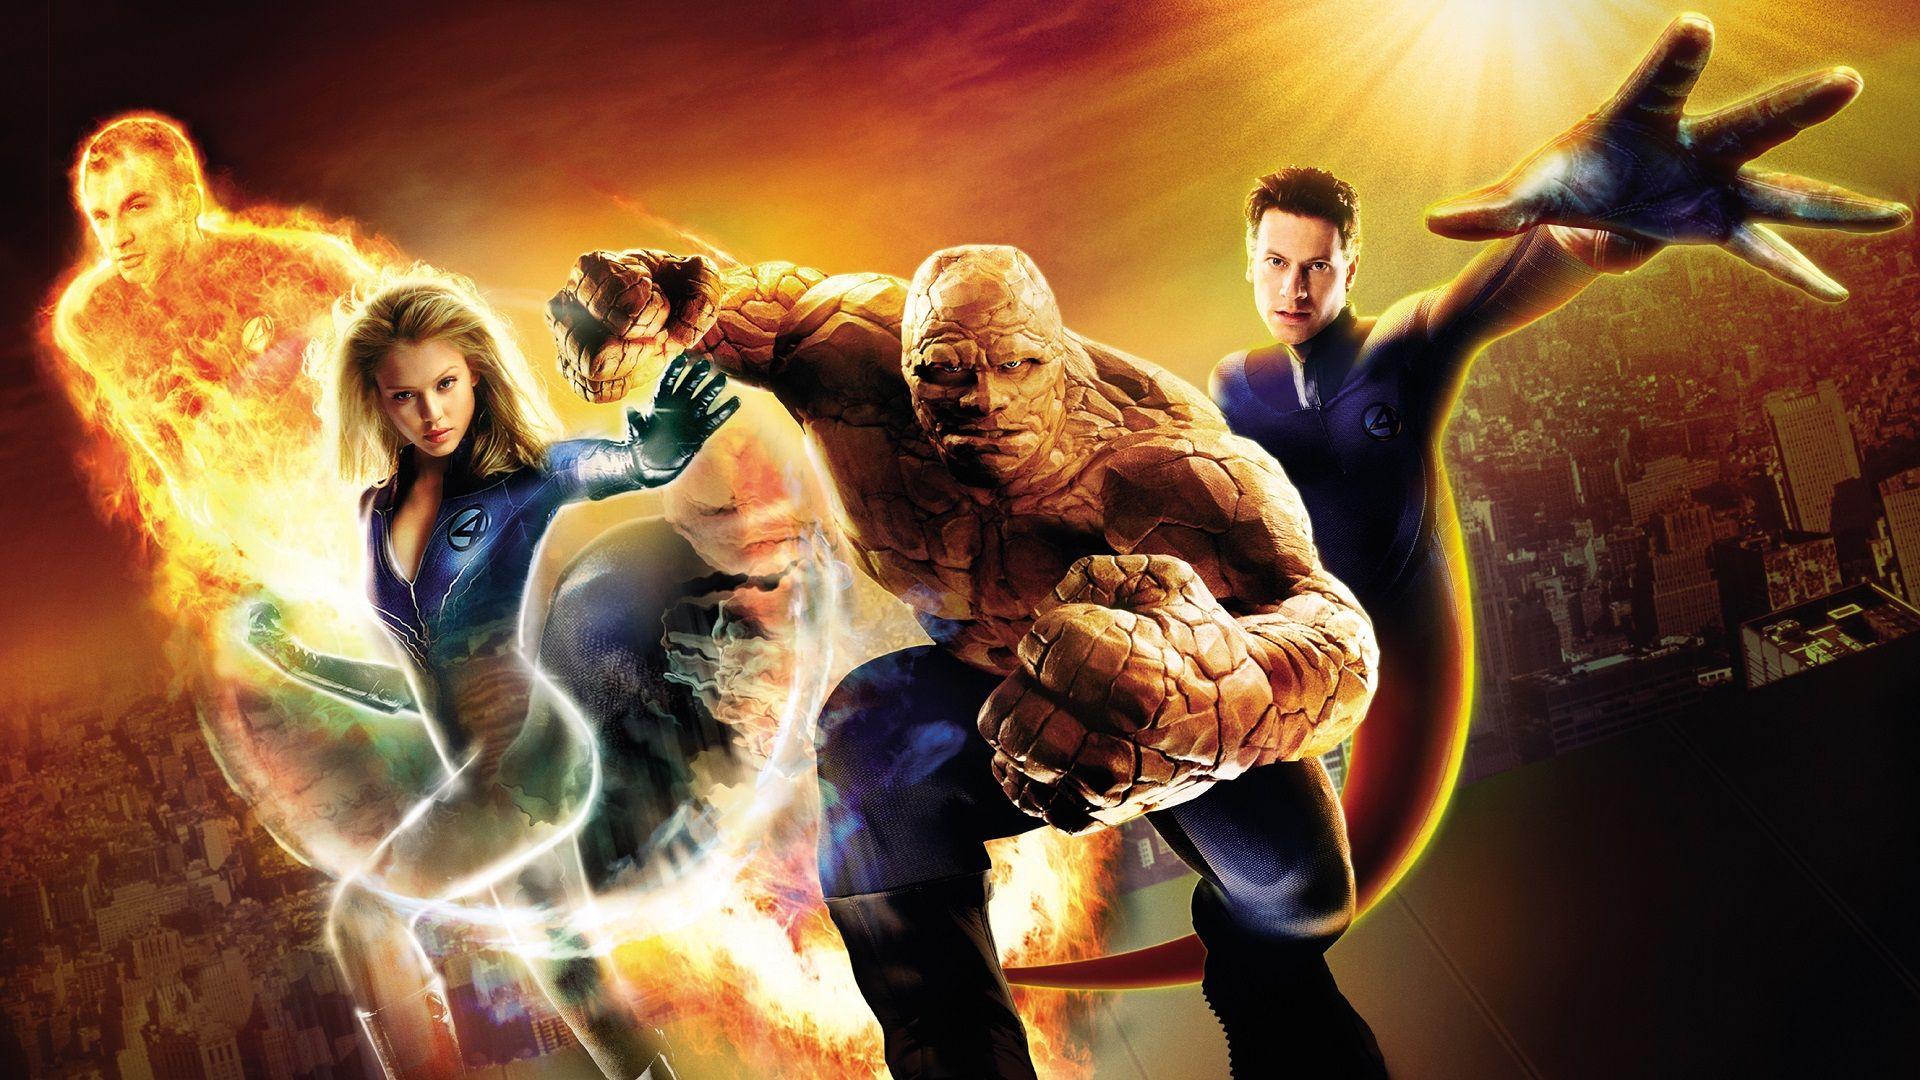 Movie Fantastic Four Thing Jessica Alba Hd Wallpaper Background Image In 2020 Captain America Wallpaper Black Cat Marvel Beast Marvel